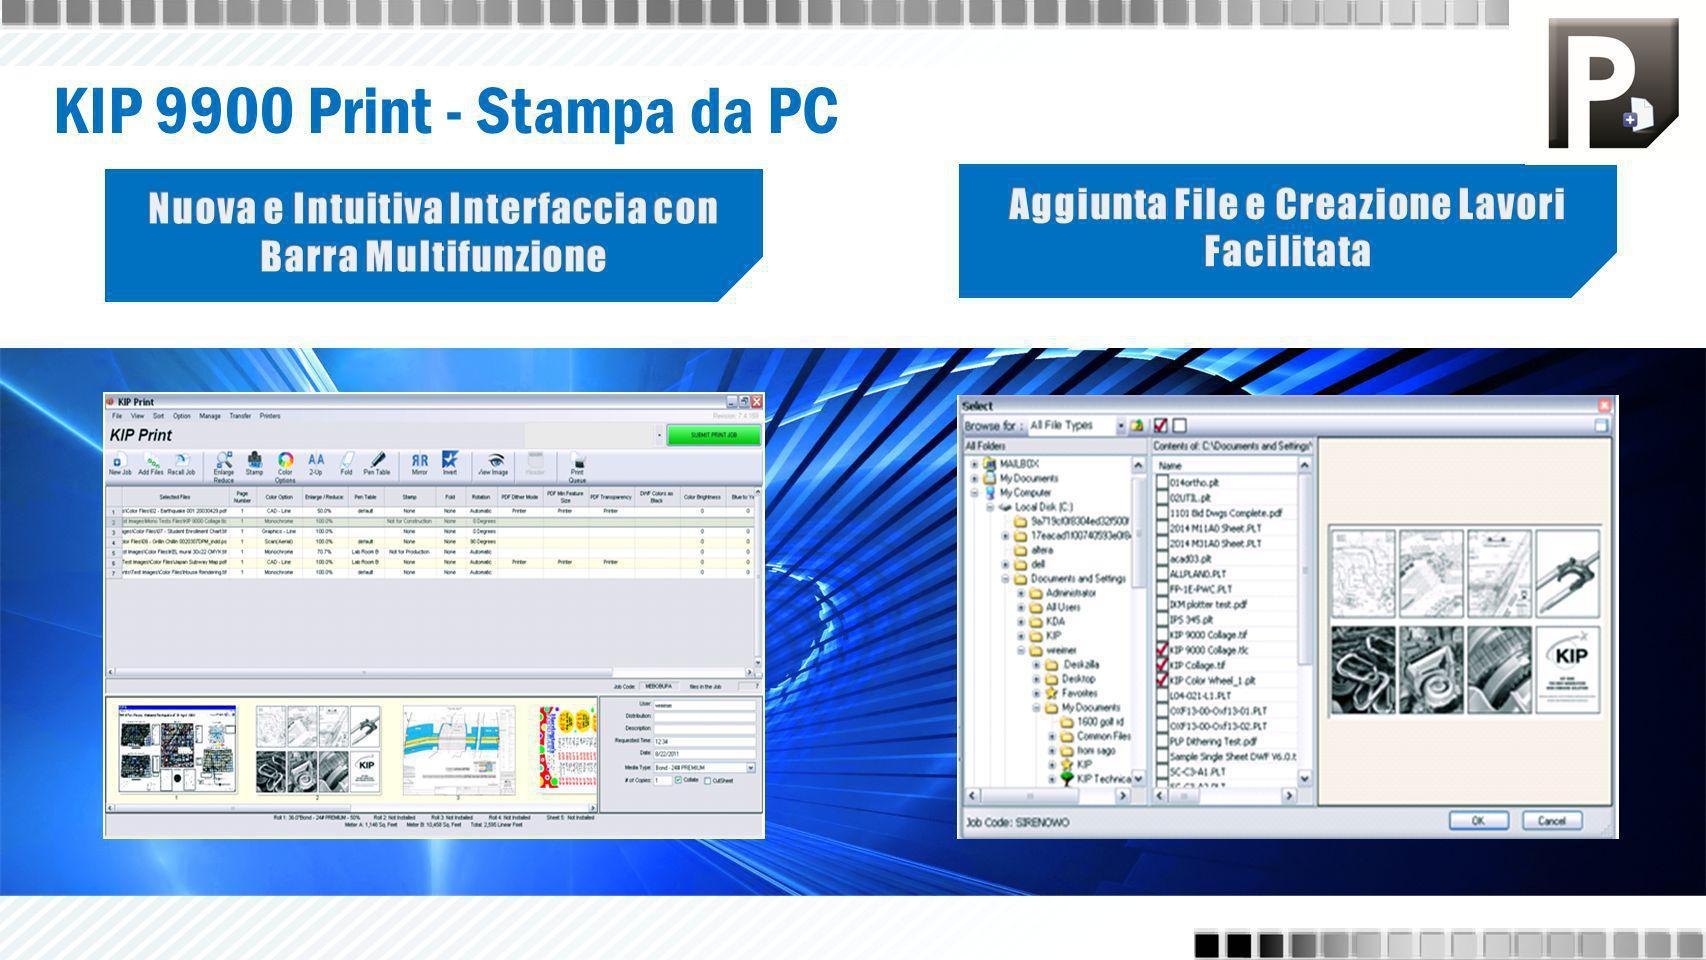 KIP 9900 Print - Stampa da PC